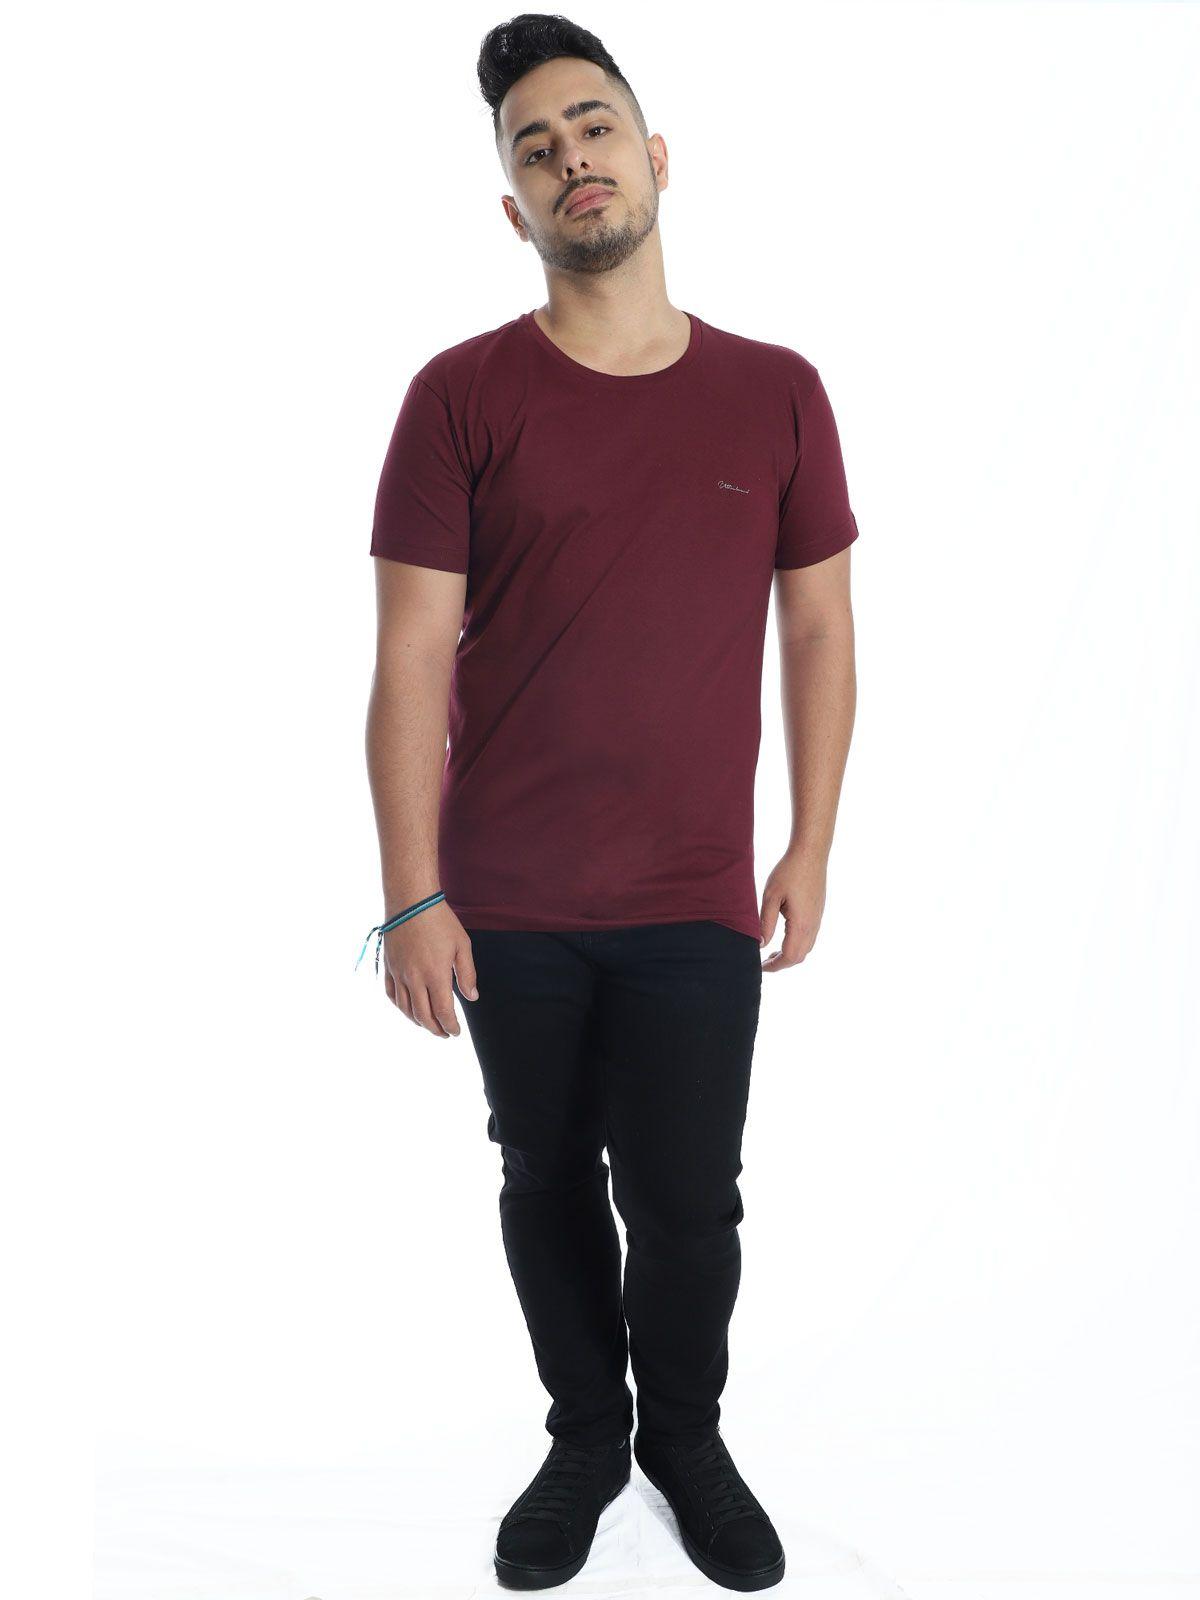 Camiseta Anistia Slim Fit Ultrabrand Vinho